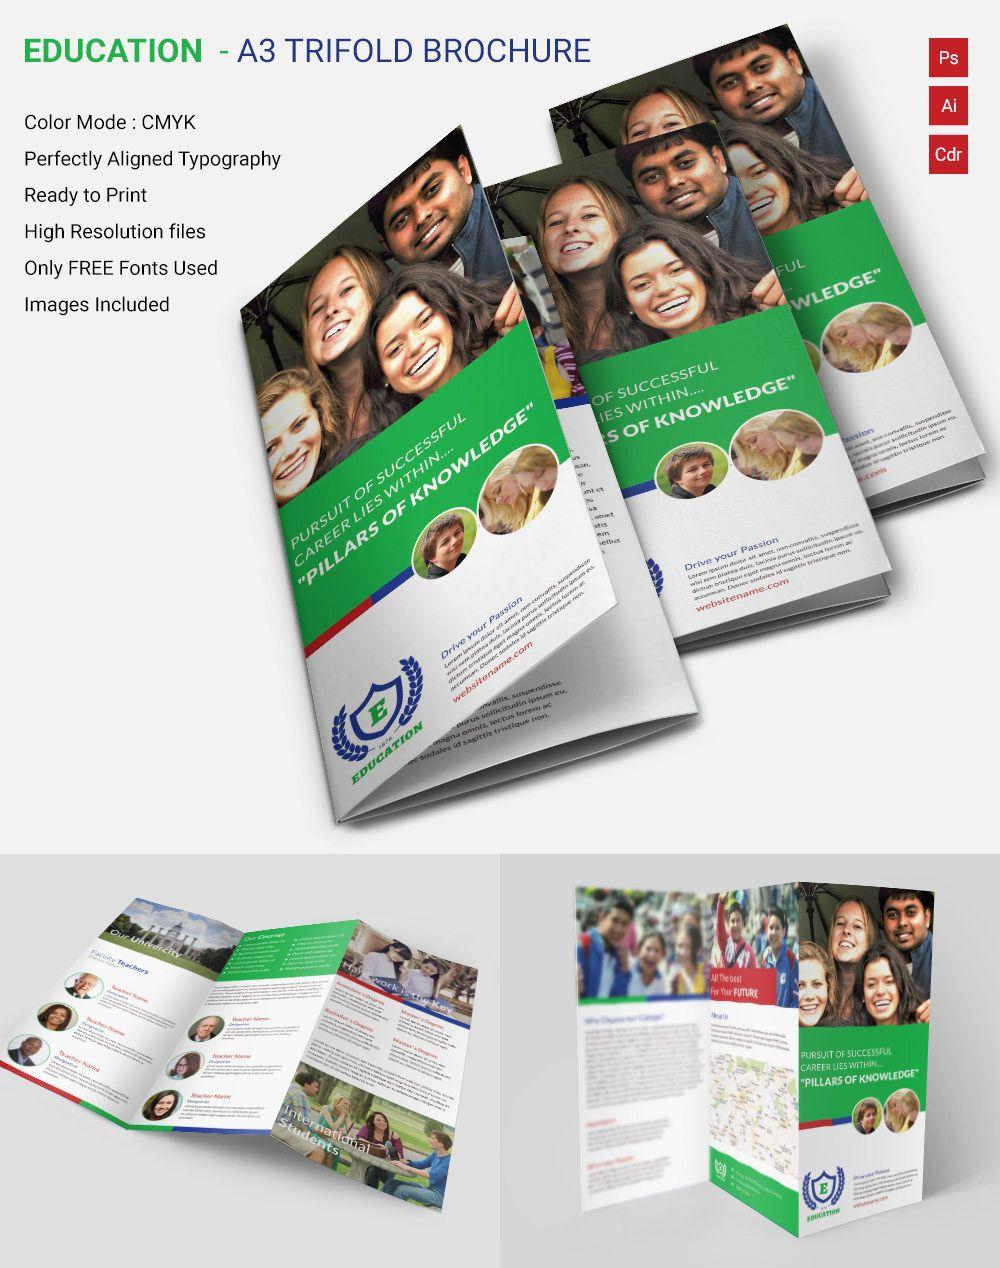 Education A3 Tri Fold Brochure Trifolds Pinterest – Microsoft Word Brochure Templates Free Download